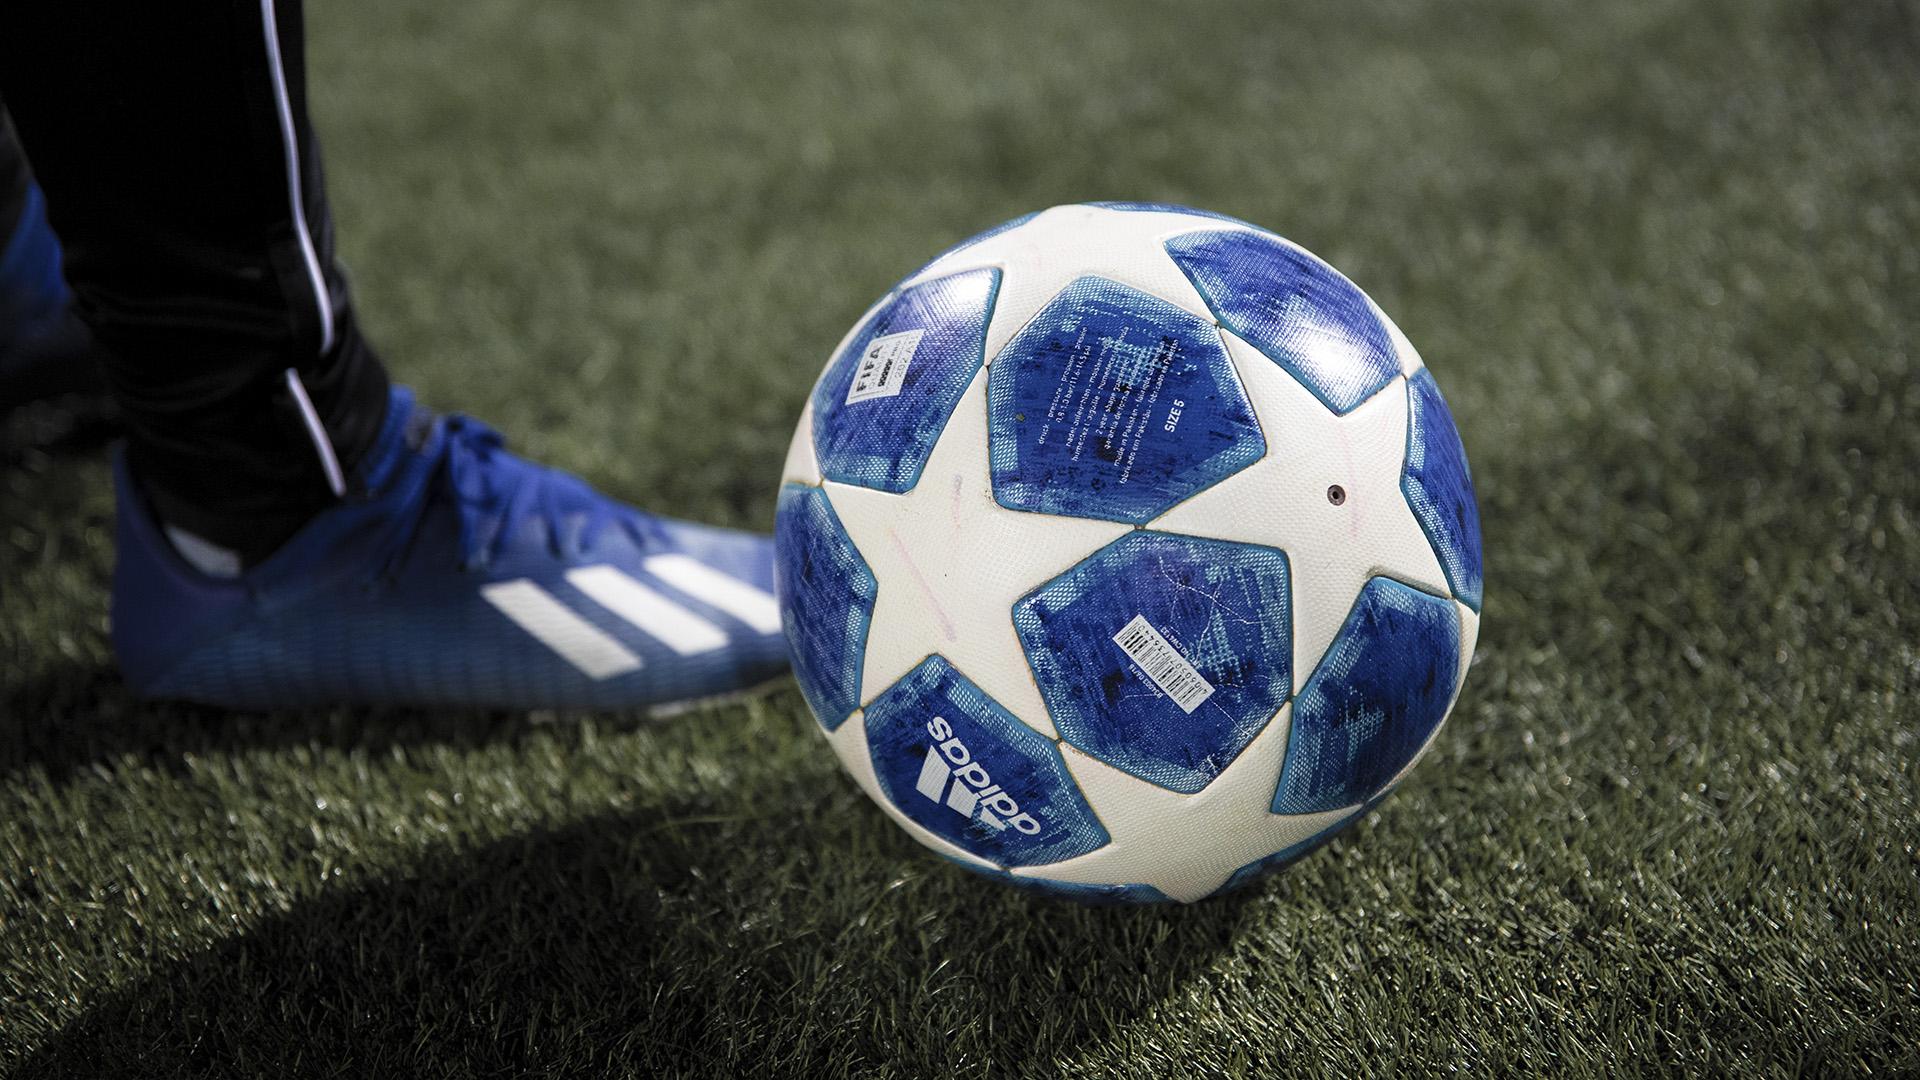 Soccer Player Seeks Refuge In Japan After Show Against Myanmar Military